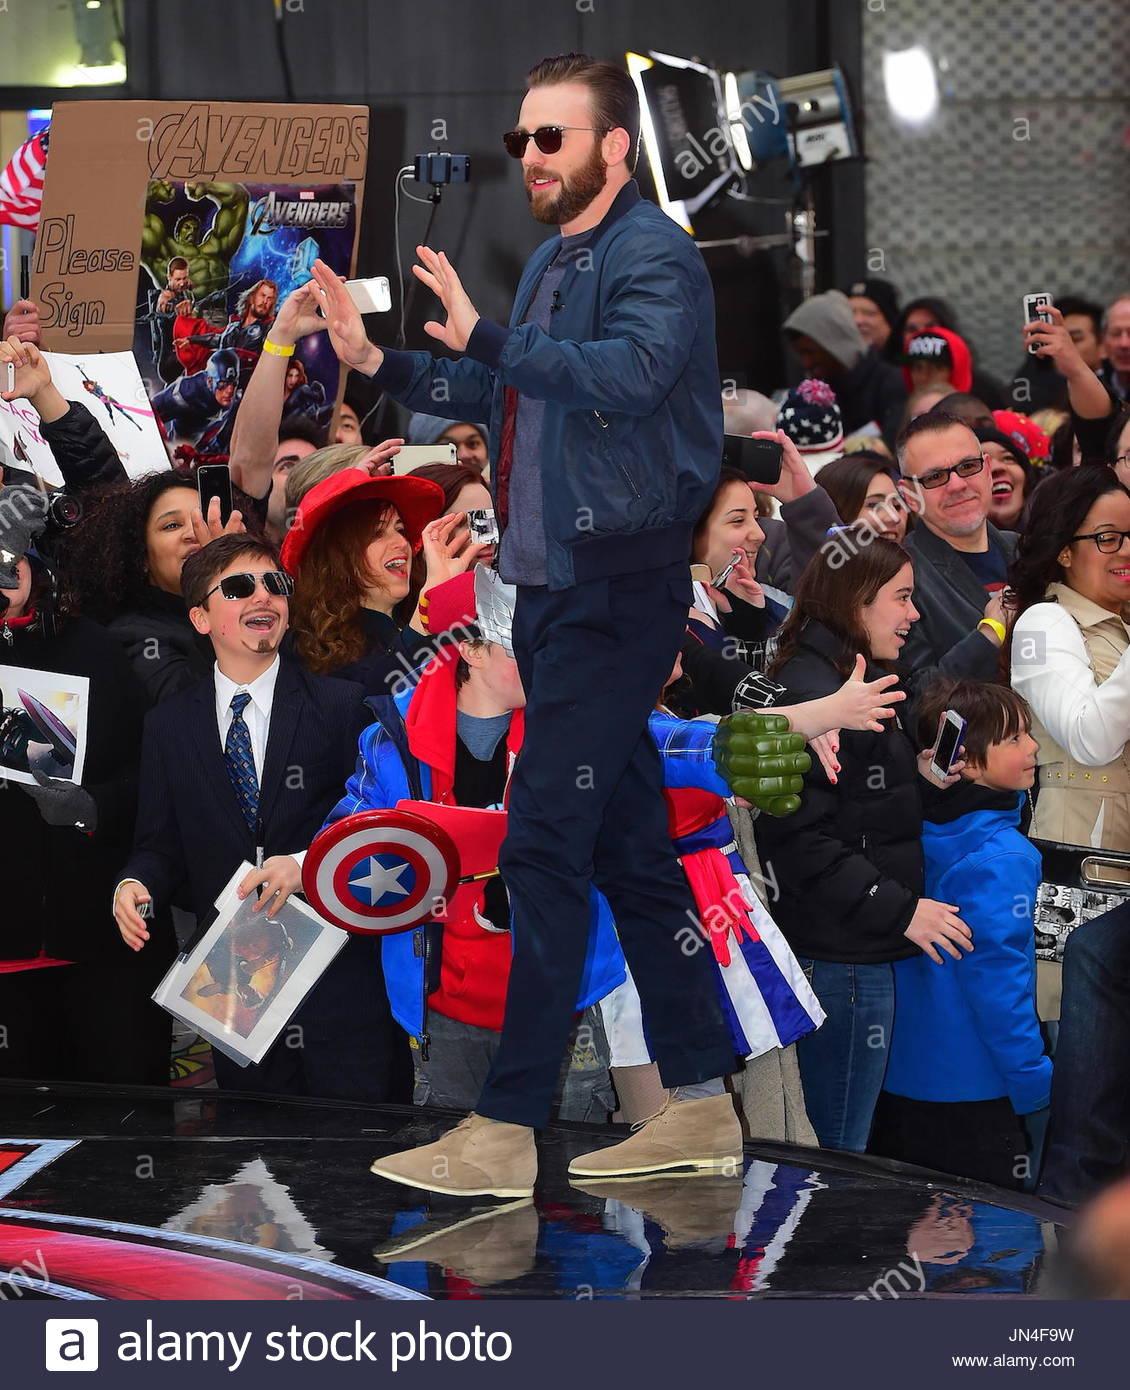 Chris Evans The Men From Avengers Minus Hemsworth Were Seen Visiting Good Morning America Robert Downey Jr Wore A Purple Blazer